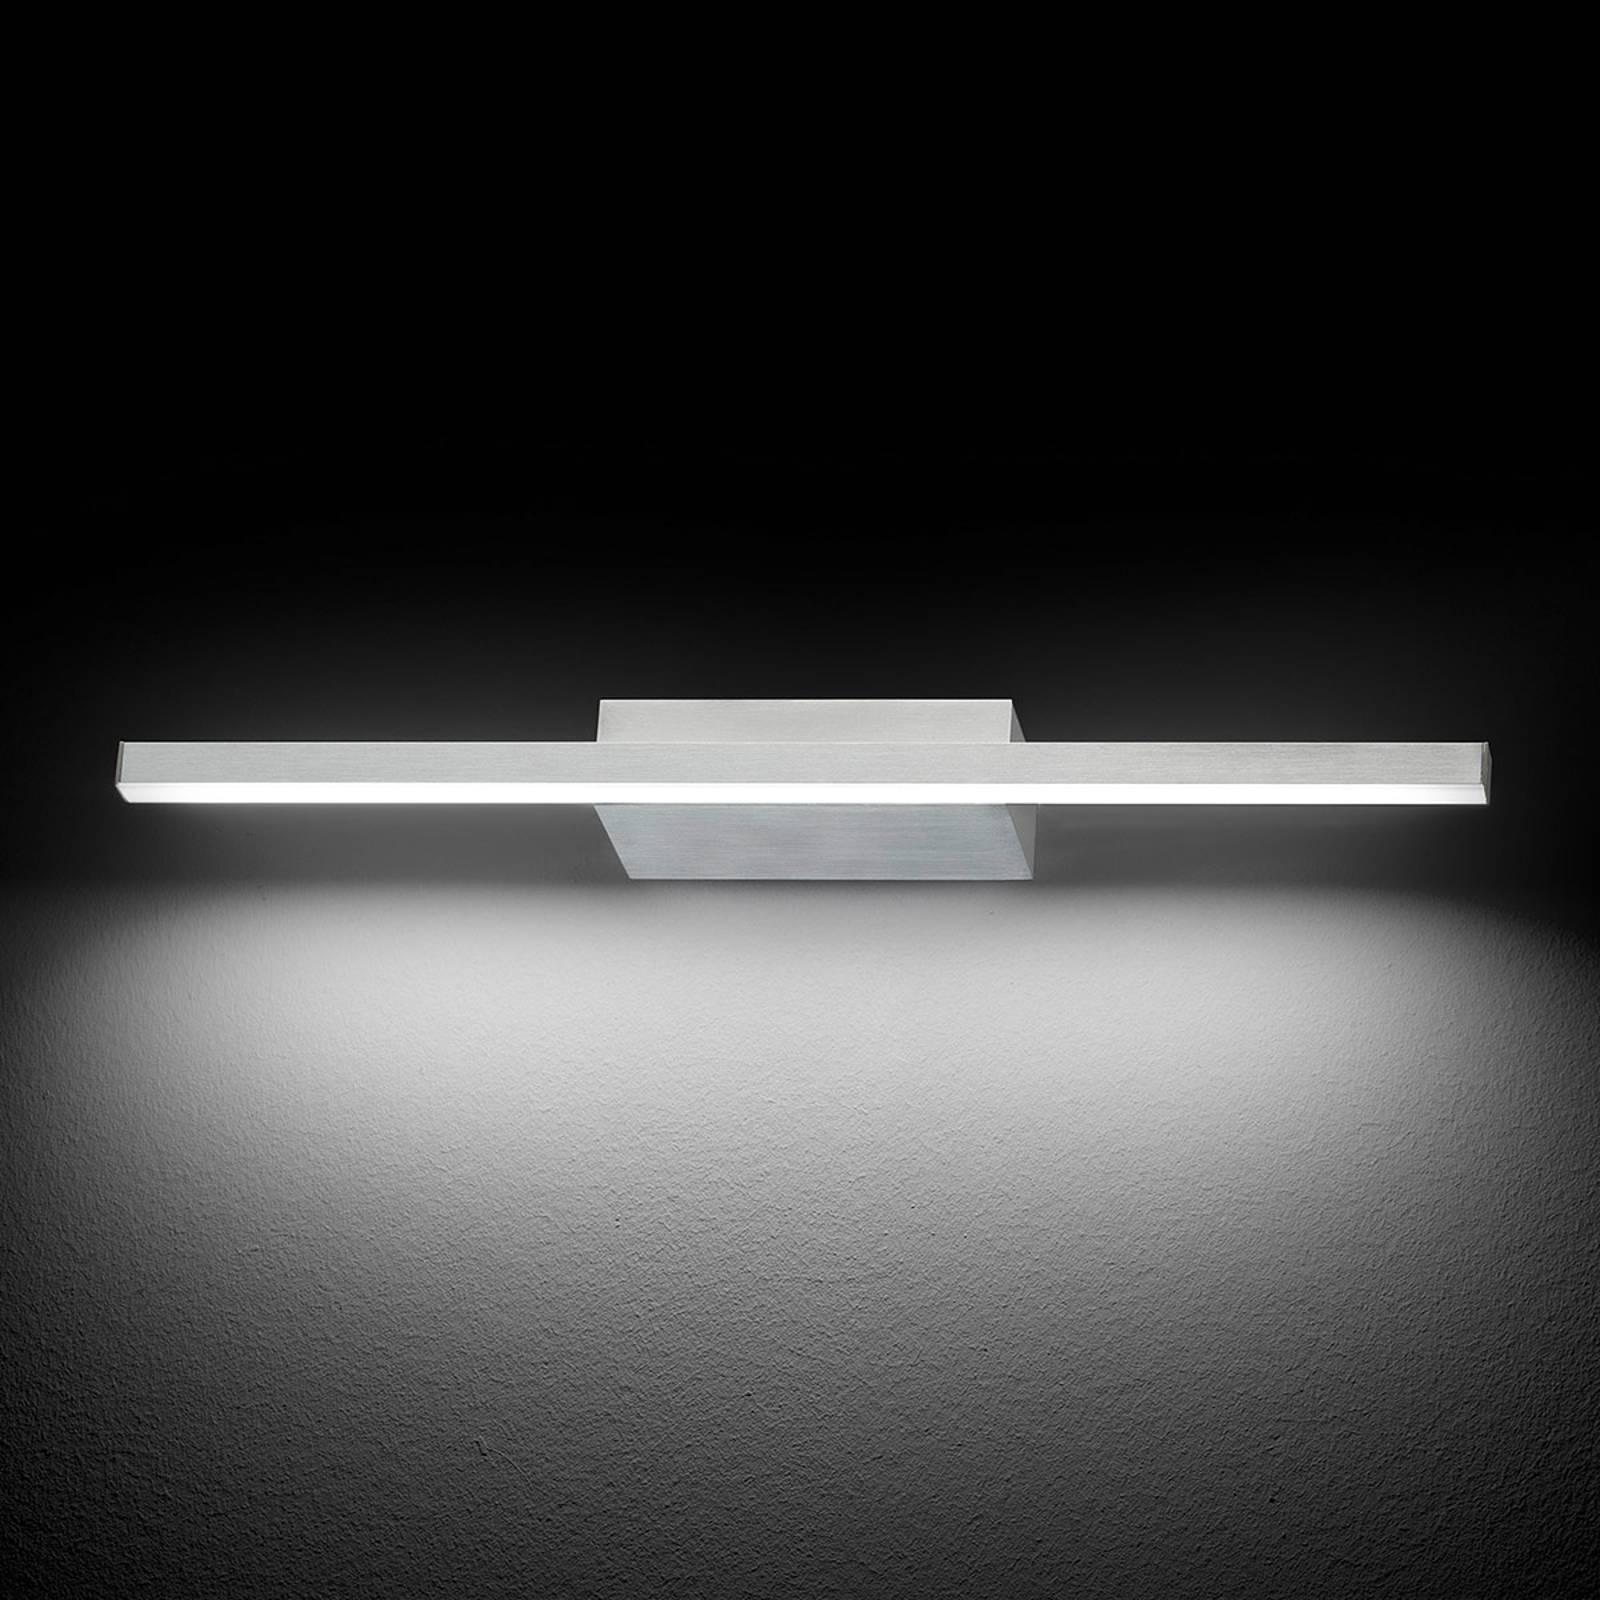 GROSSMANN Forte applique a LED, alluminio 49,4 cm